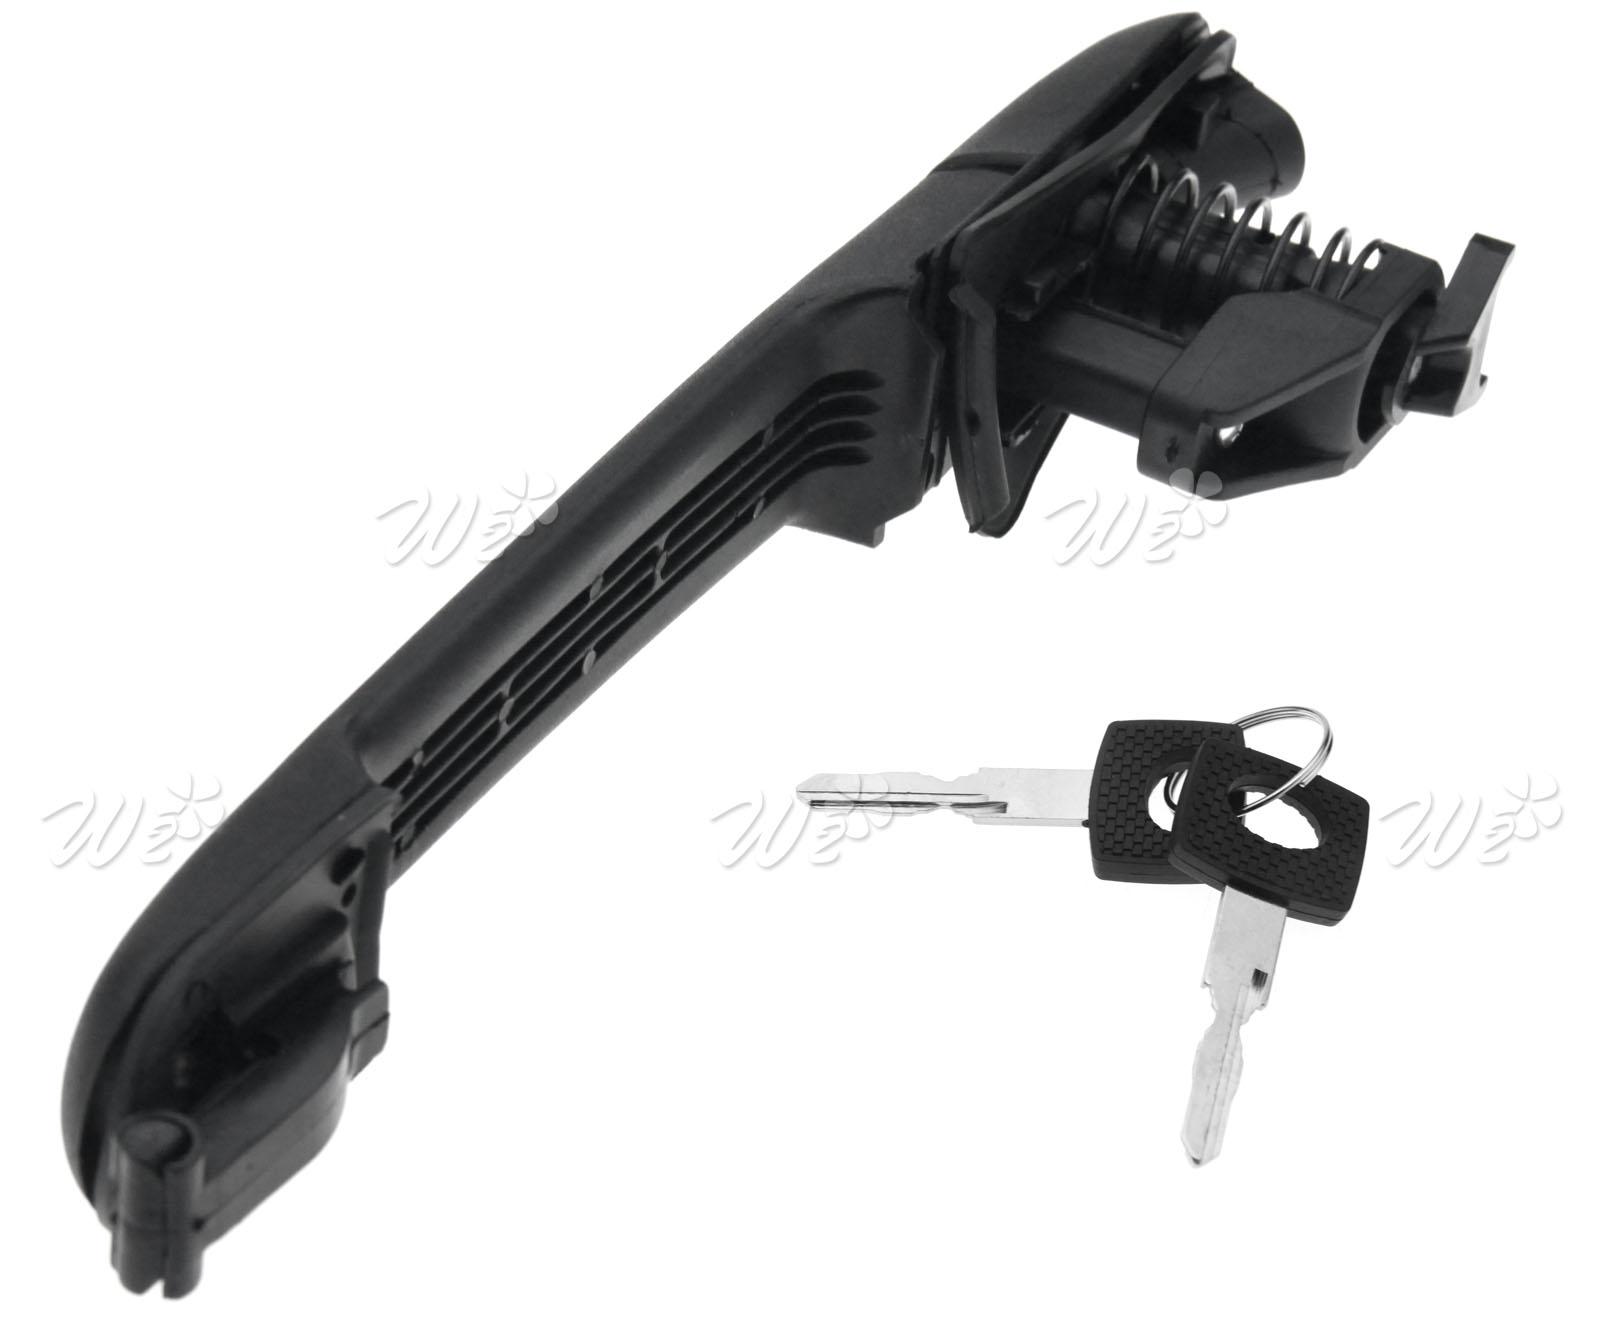 Front DOOR HANDLE 2 KEYS /& LOCK FOR MERCEDES SPRINTER VITO ATEGO VW LT